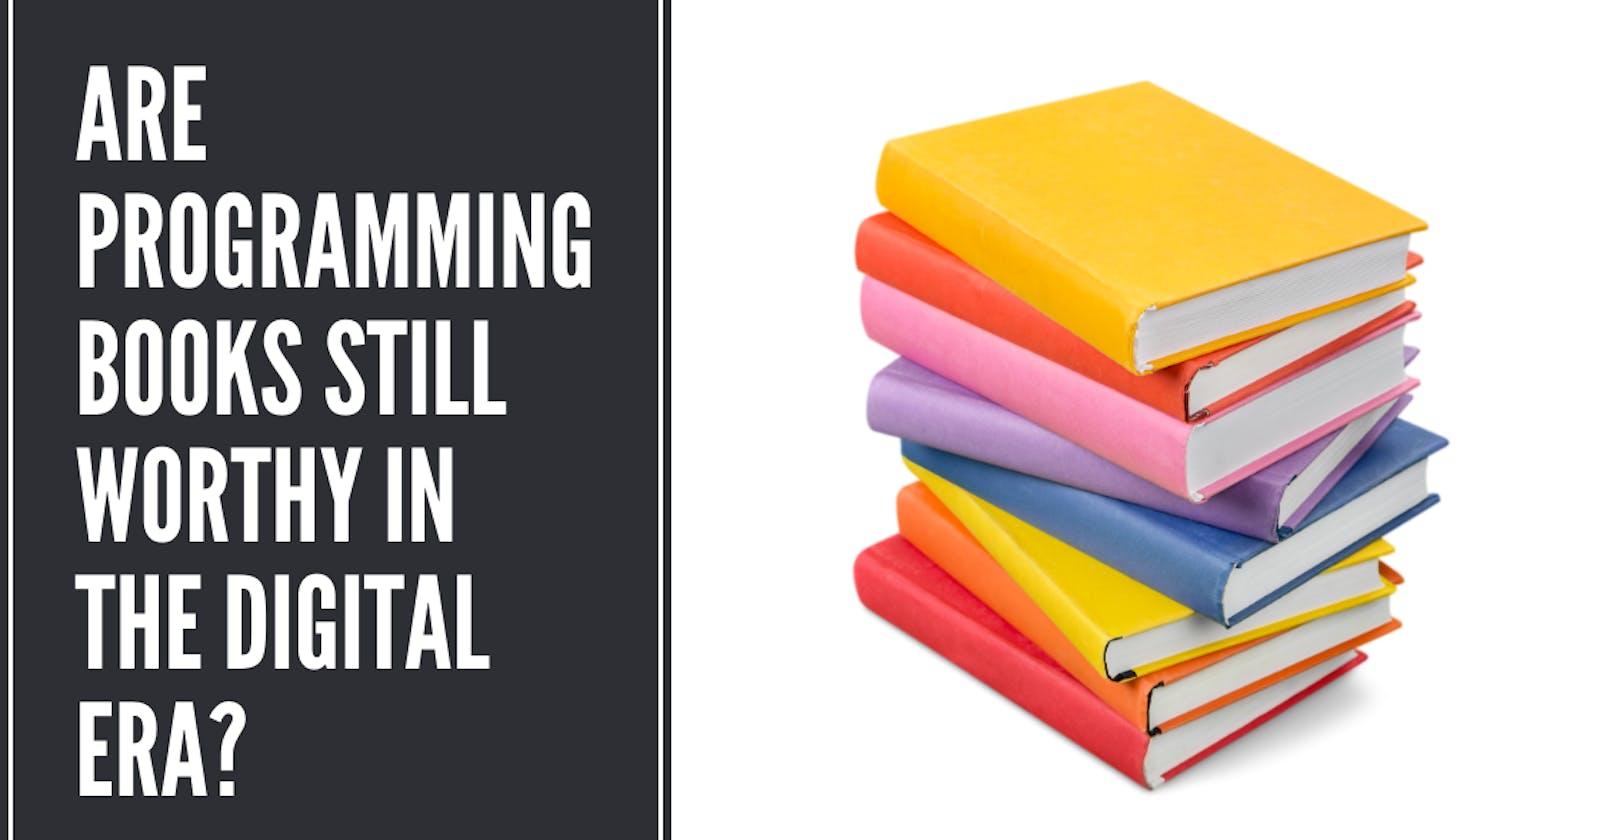 Are programming books still worthy in the digital era?